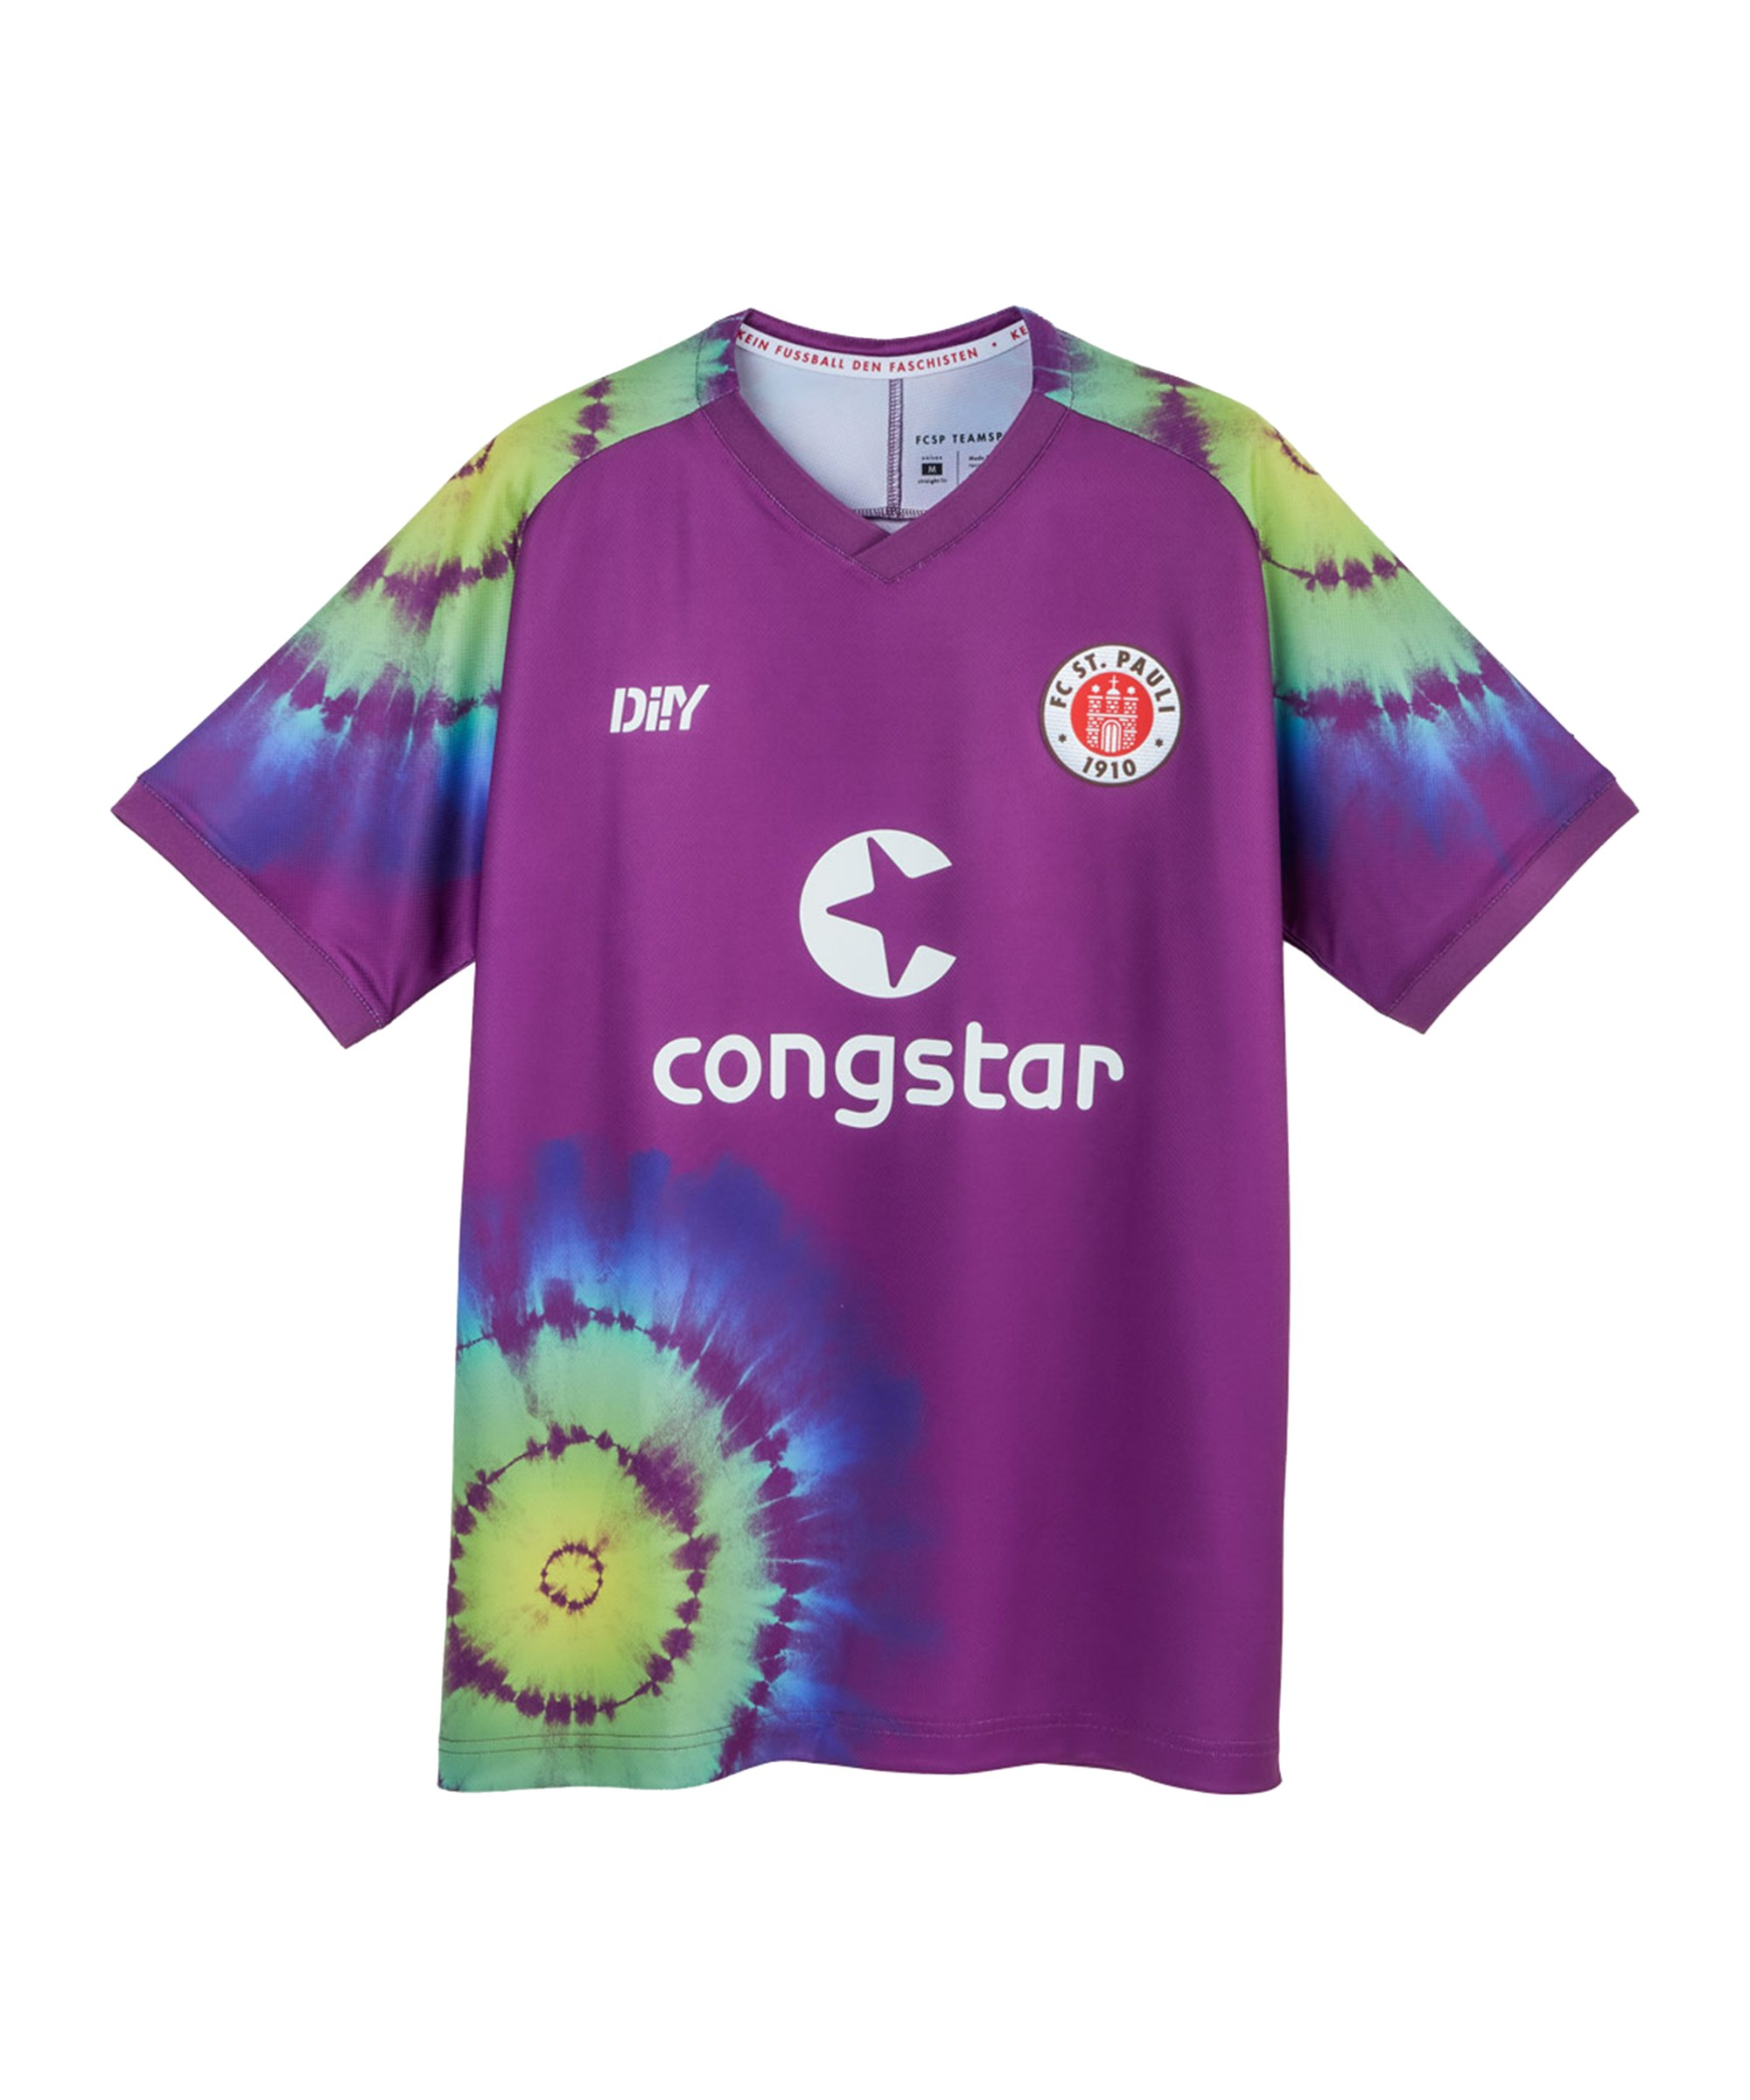 DIIY FC St. Pauli Torwartrikot 2021/2022 Lila - lila